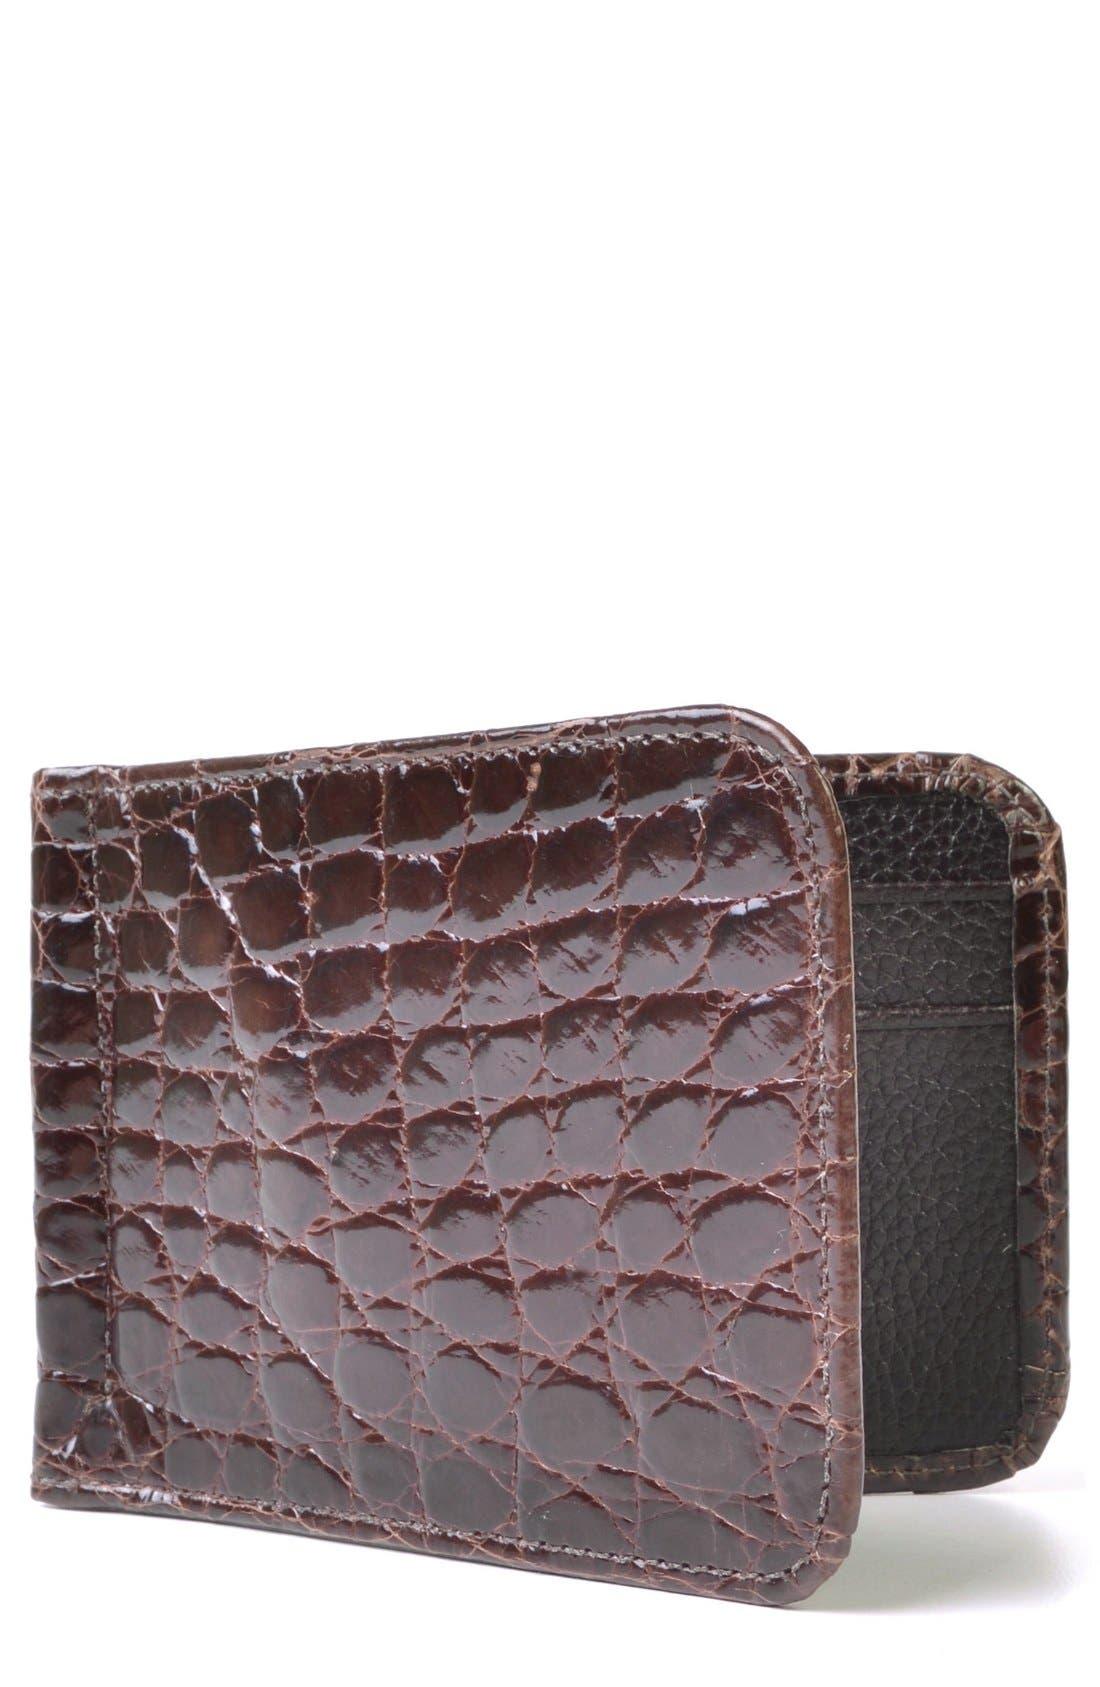 Martin Dingman 'Joseph' Genuine American Alligator Leather Money Clip Wallet